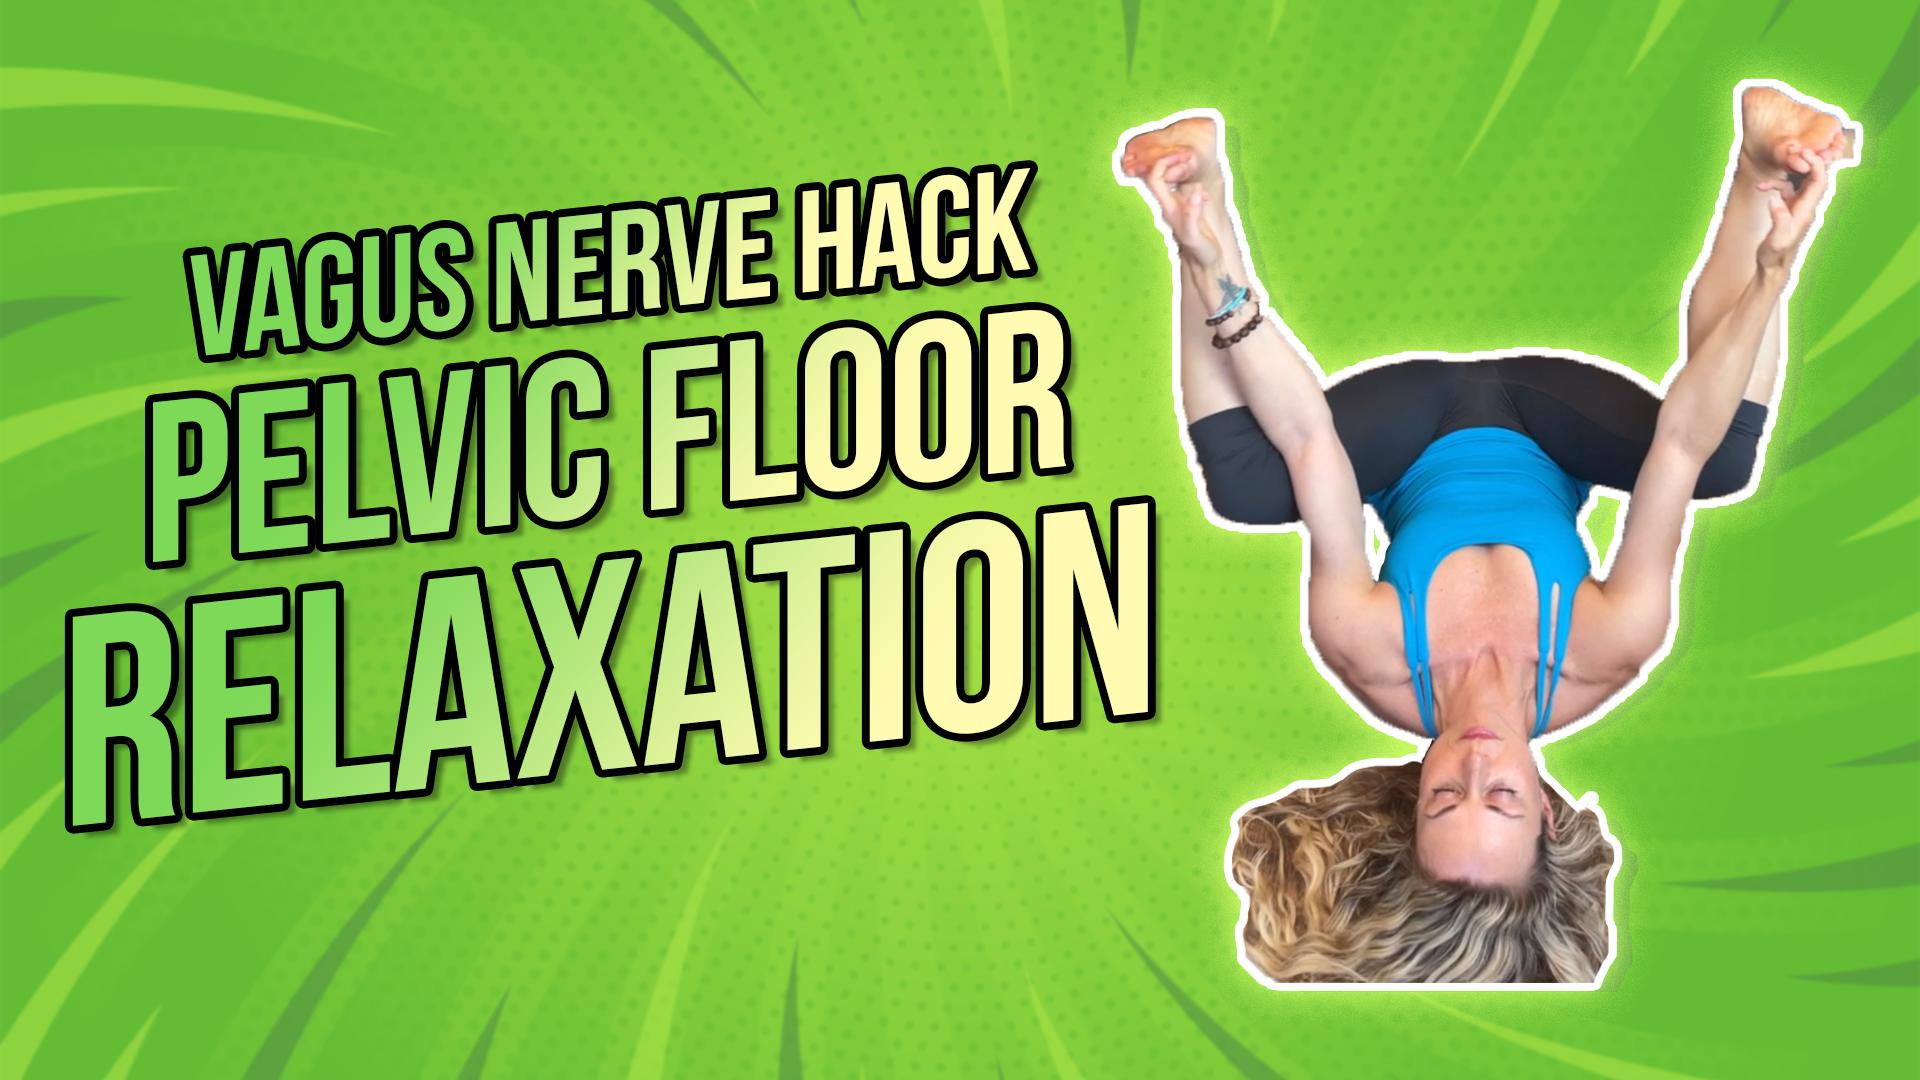 Vagus Nerve Hack | Pelvic Floor Relaxation